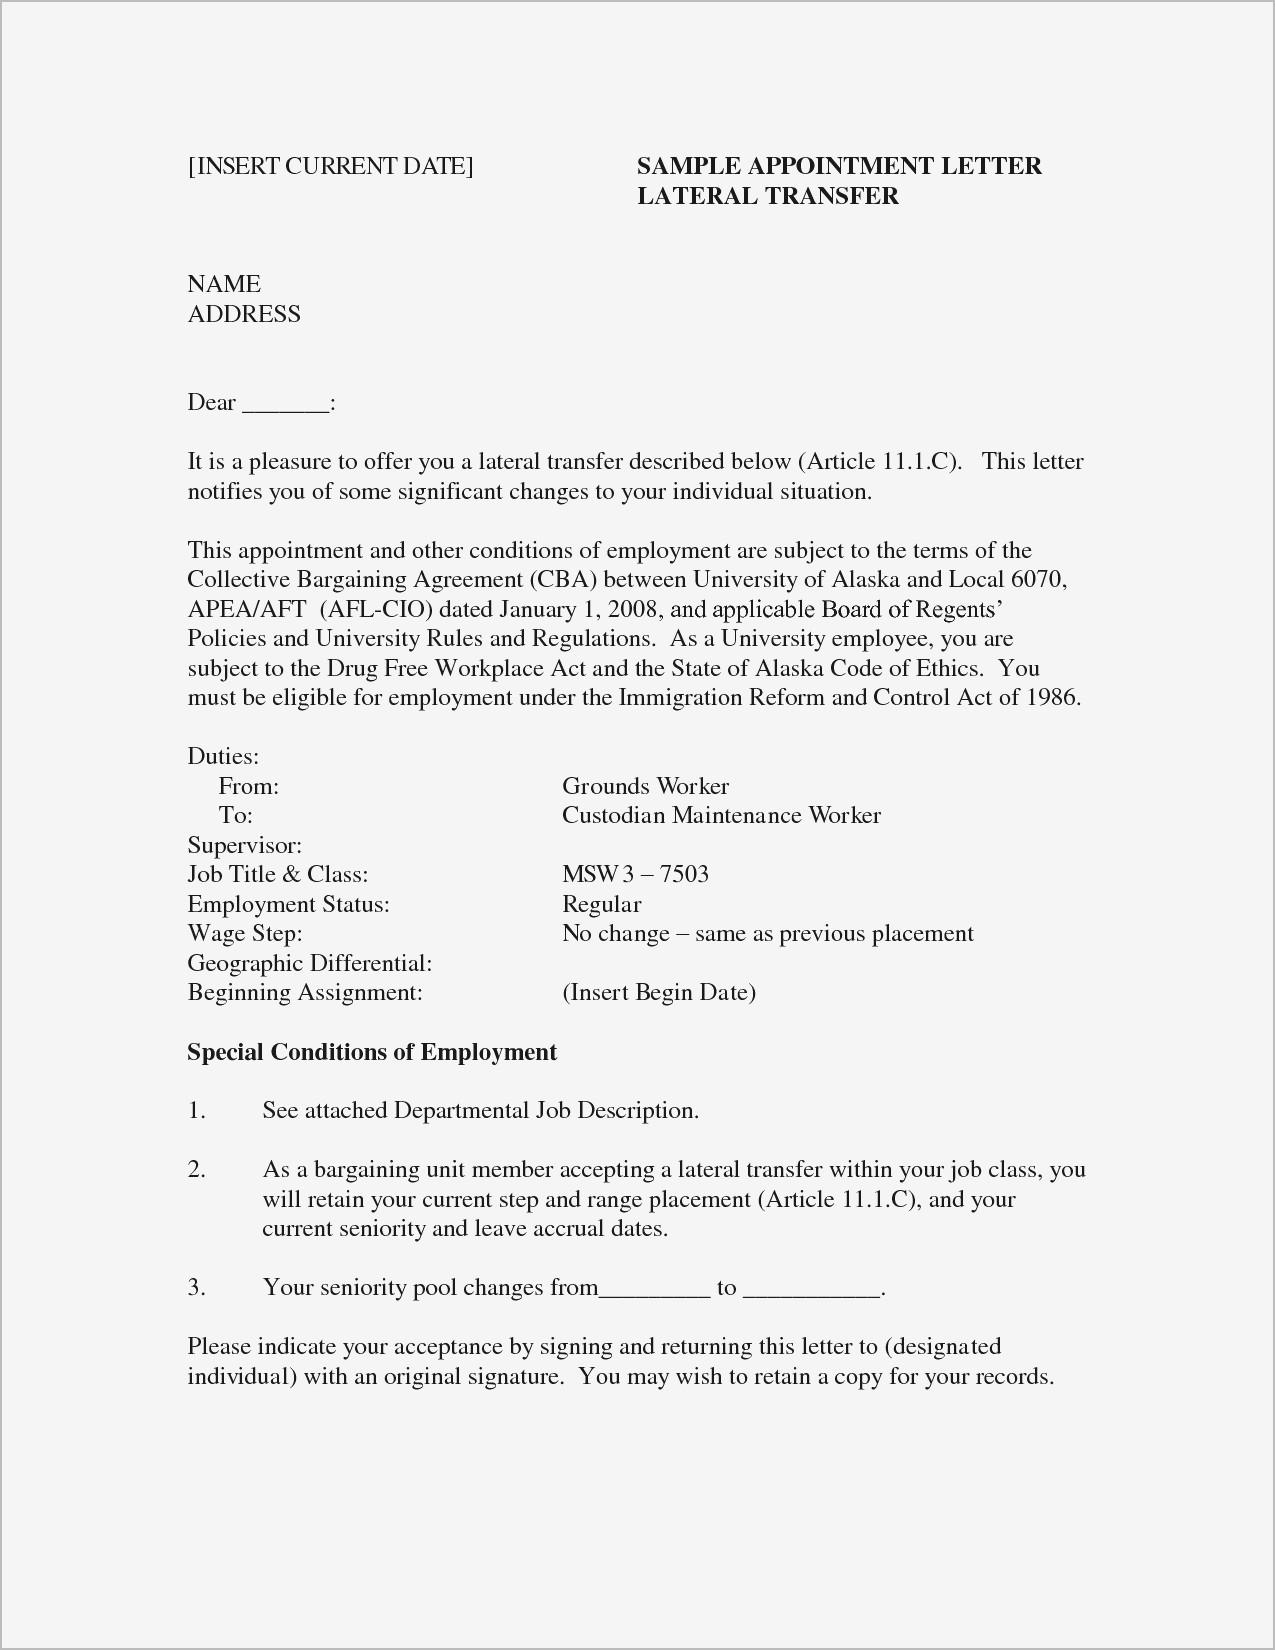 Job Letter Offer Template - Accepting A Job Fer Letter Valid Job Fer Letter Template Us Copy